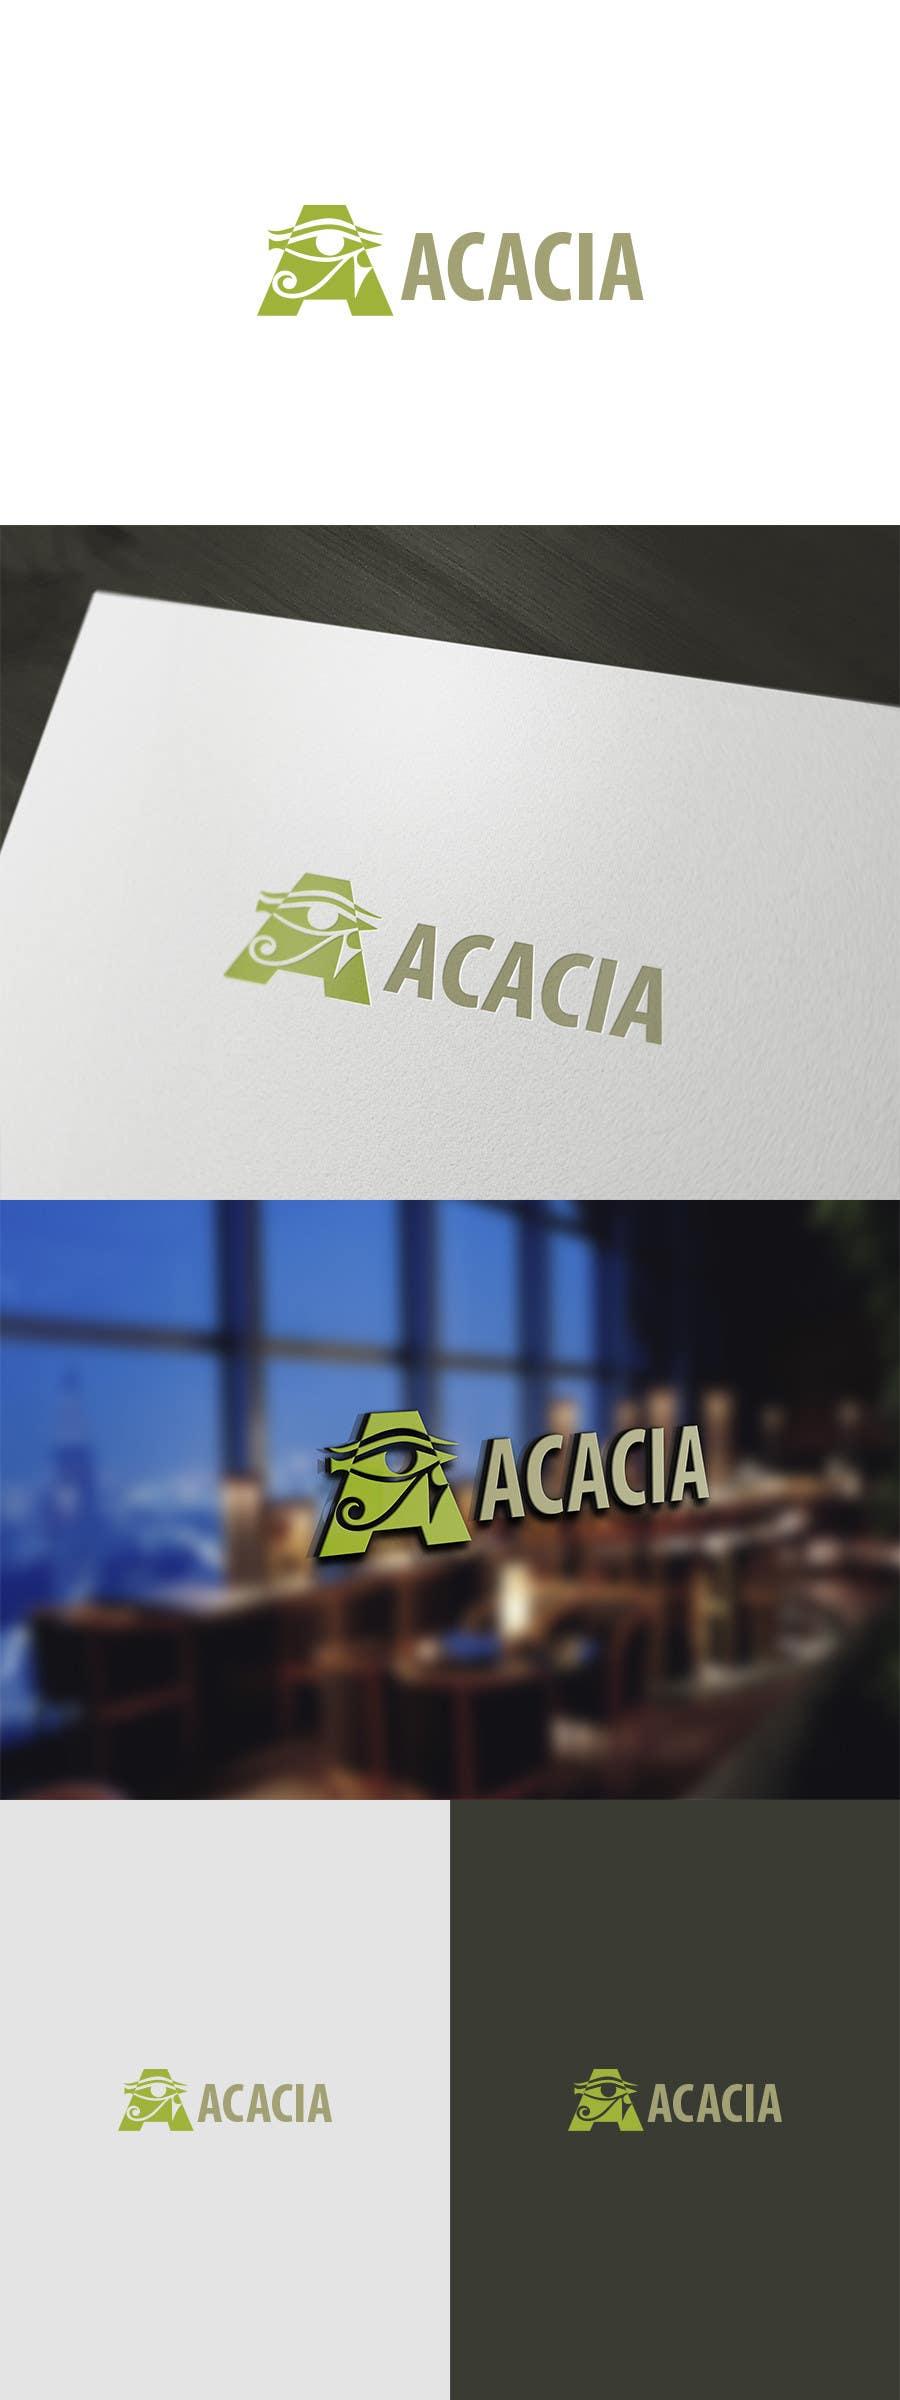 Konkurrenceindlæg #43 for Logo and Business Card Design (Corporative Identity)